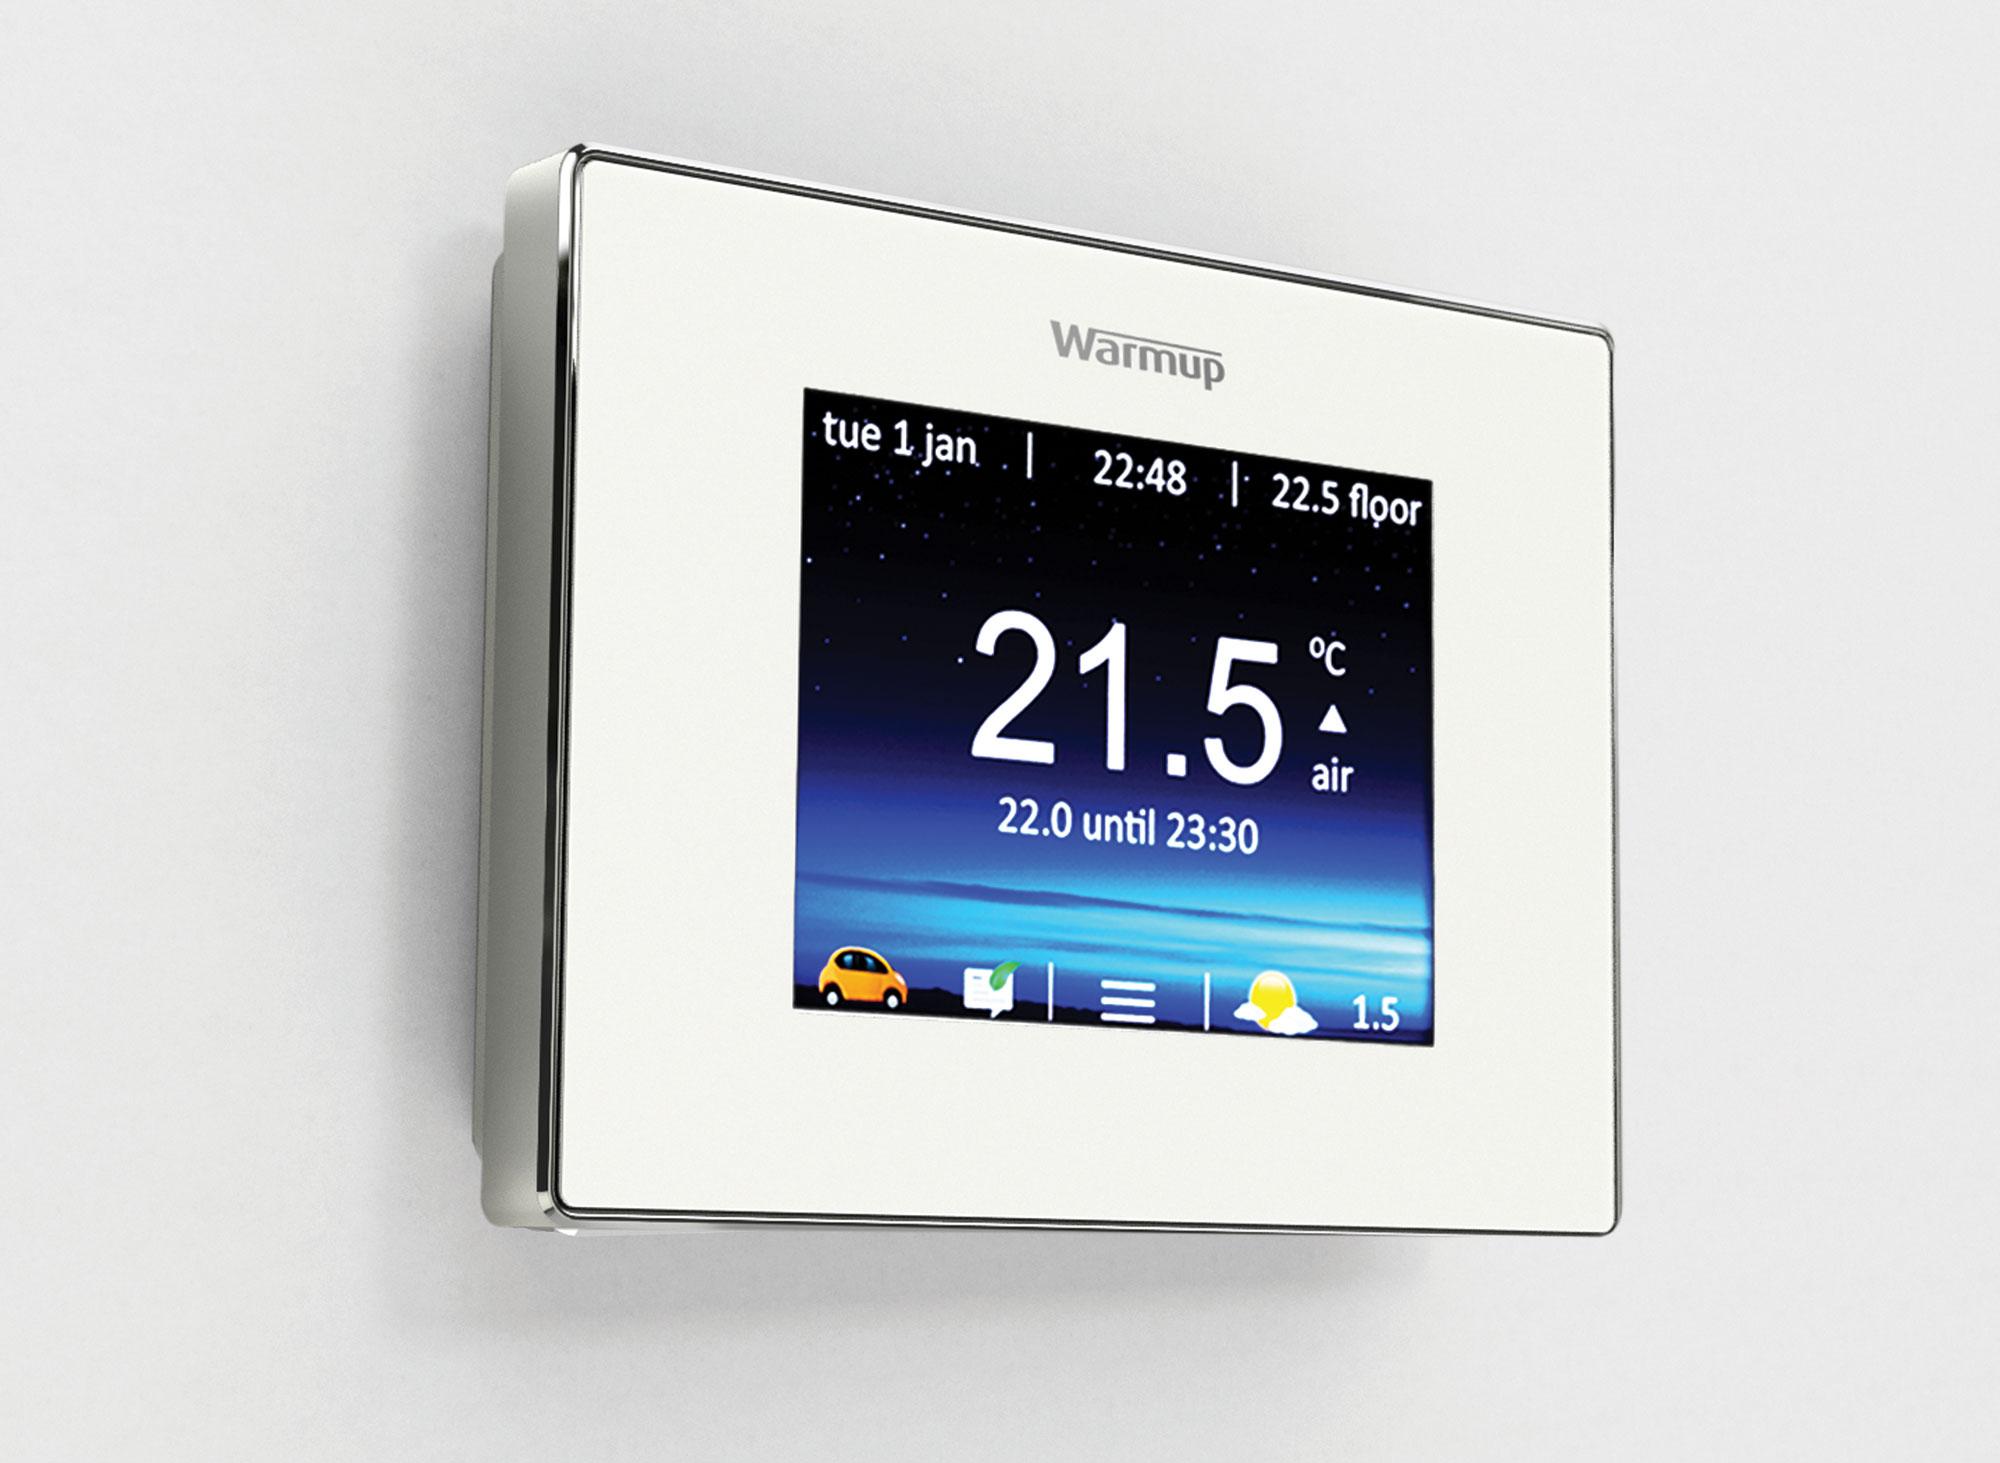 hight resolution of warmup underfloor heating thermostat wiring diagram